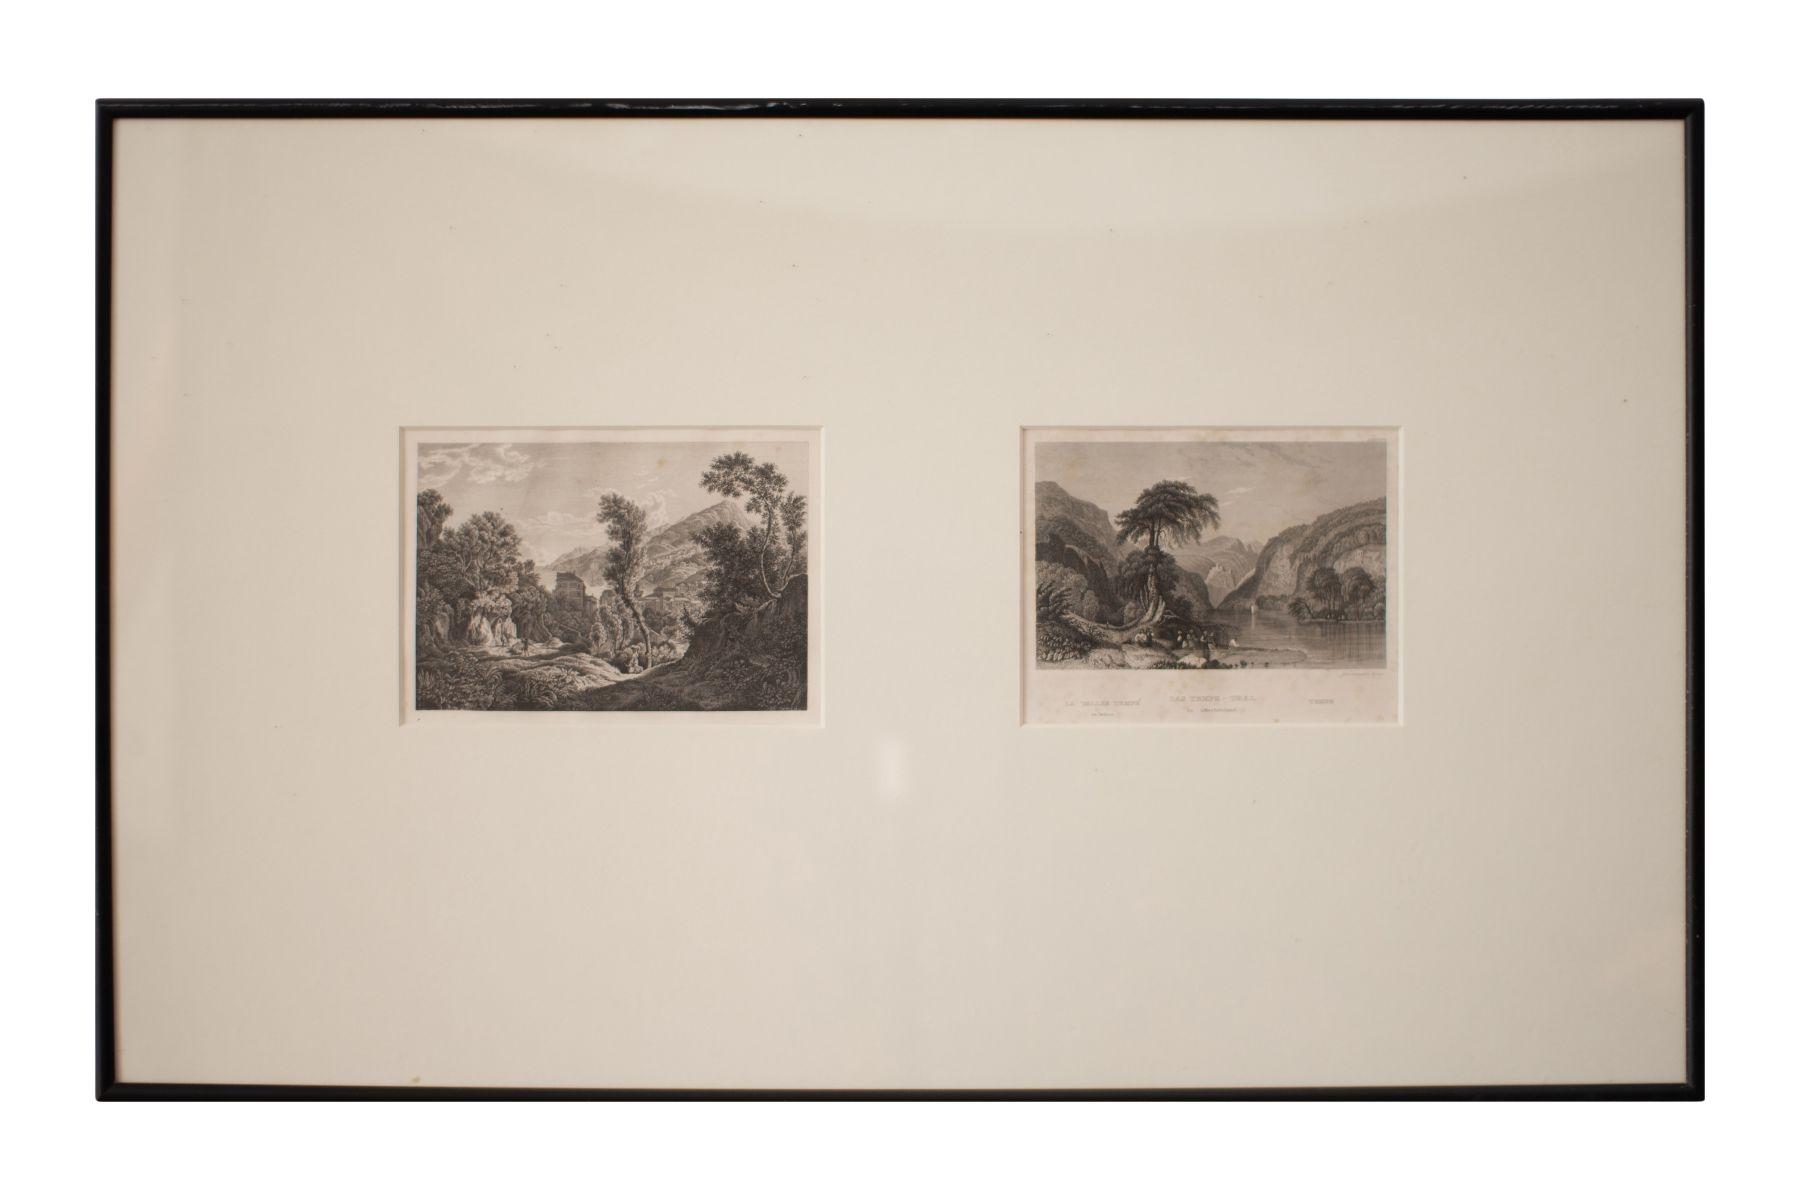 #144 2 Small Prints, Valley of the Temples in Greece   2 kleine Druckgrafiken, Tal der Tempel in Griechenland Image